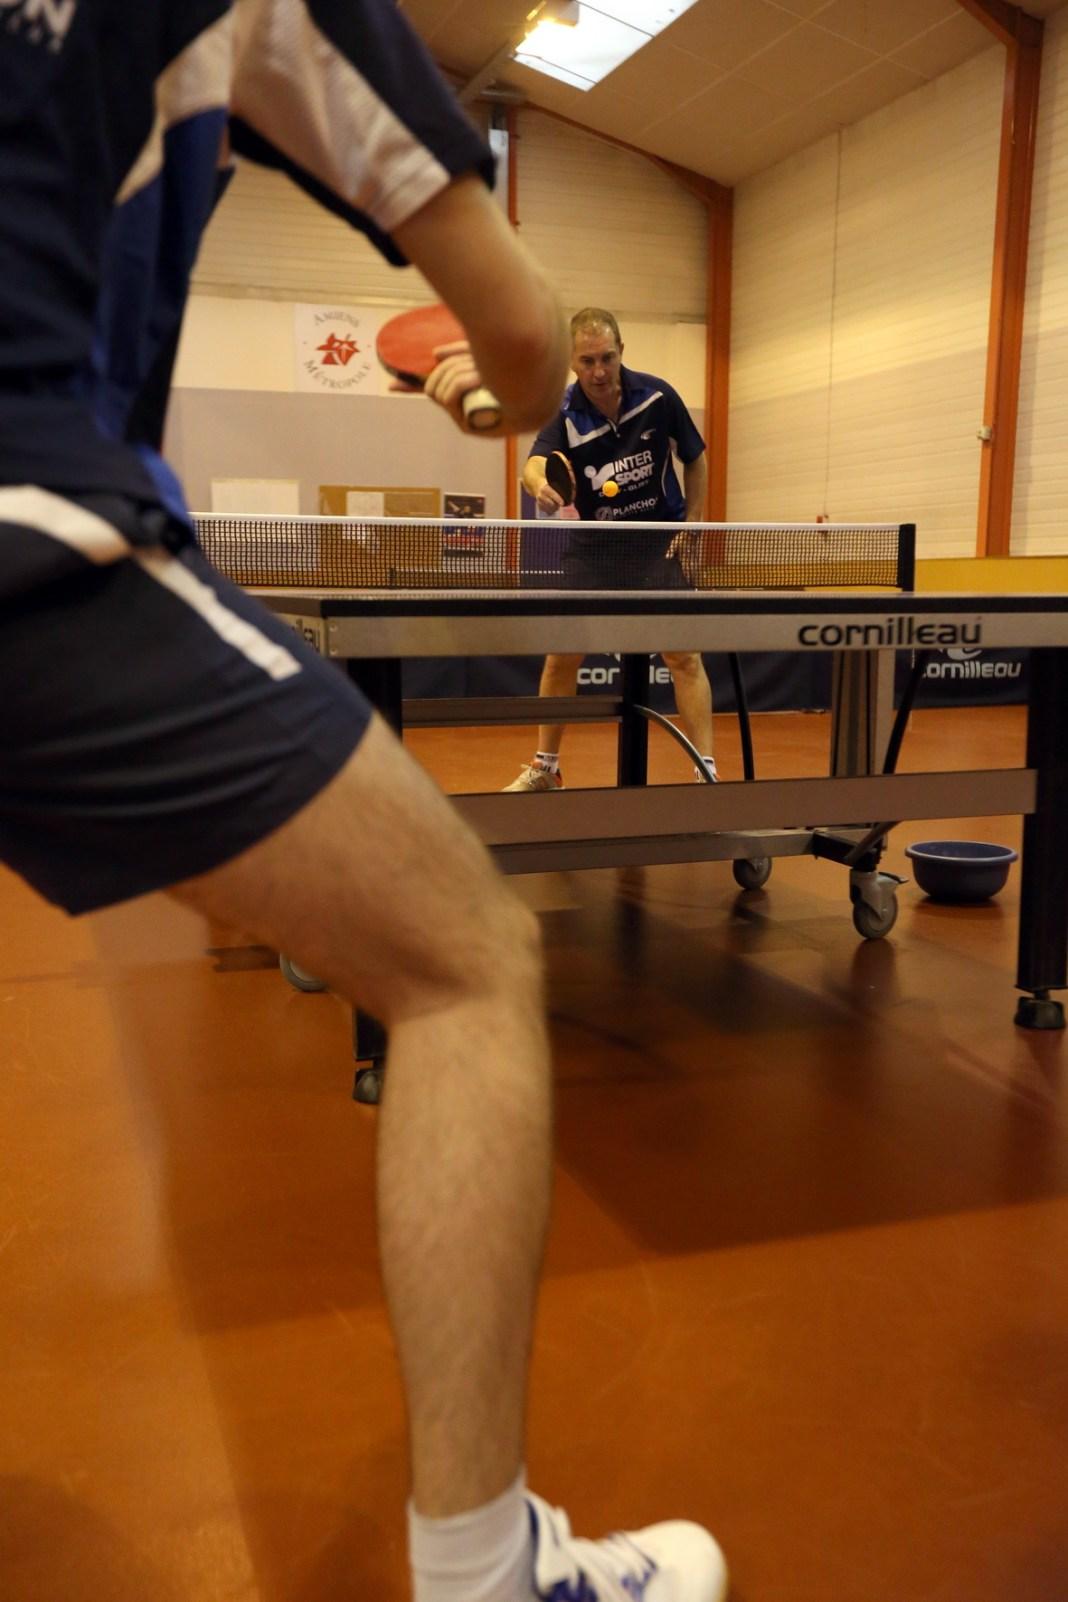 astt-tennis de table amiens 0100 - leandre leber - gazettesports